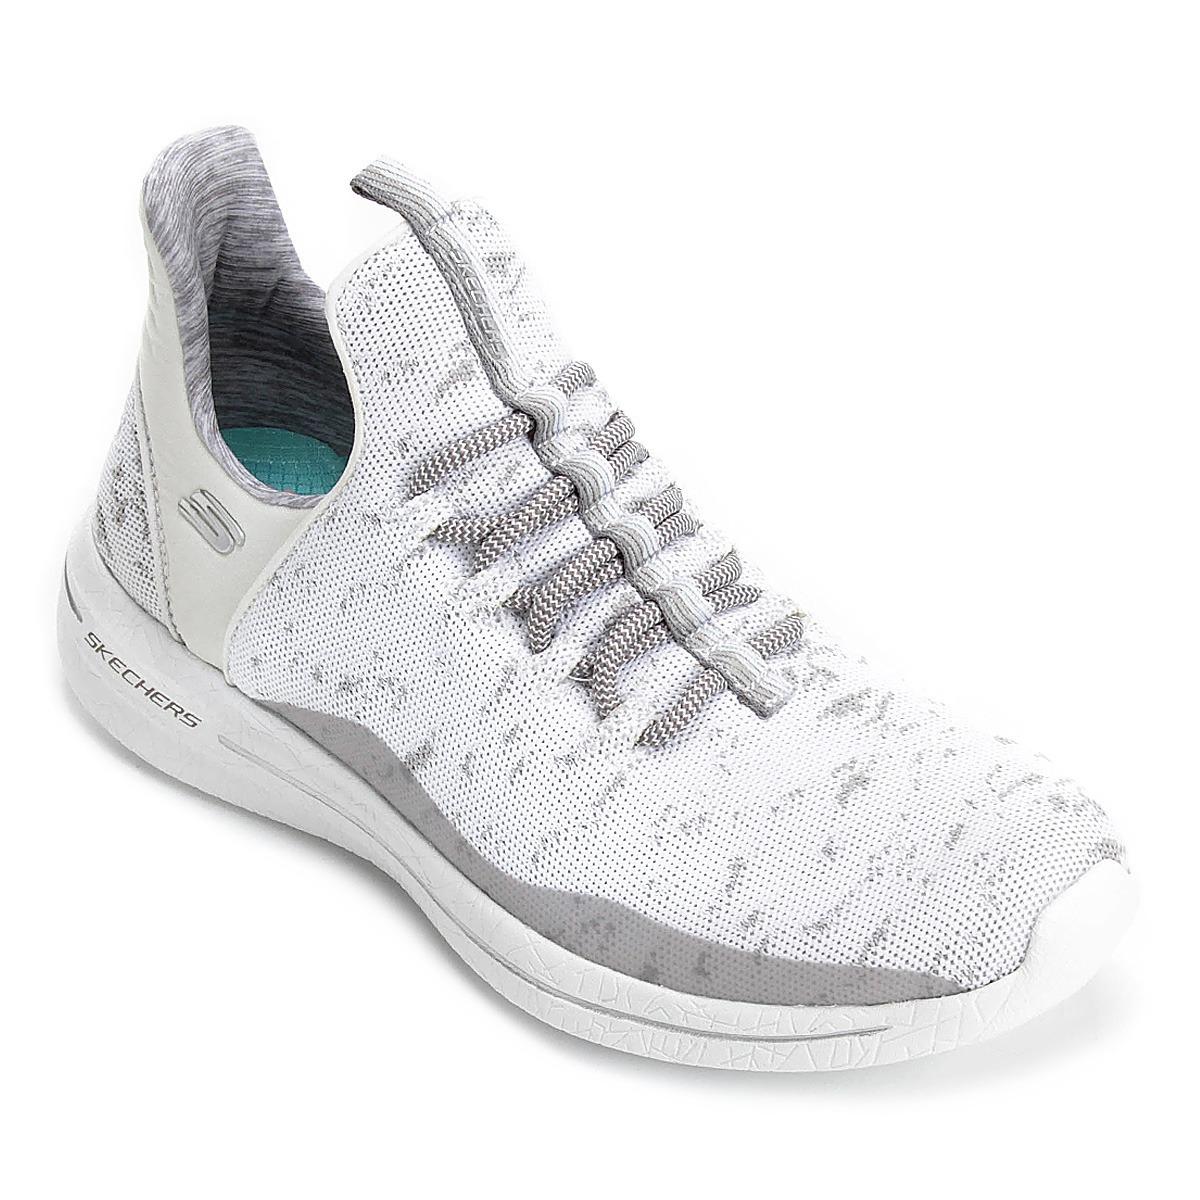 3f56bd4c3c9 Tenis Skechers Burst Walk New Avenues Original Feminino - R  349